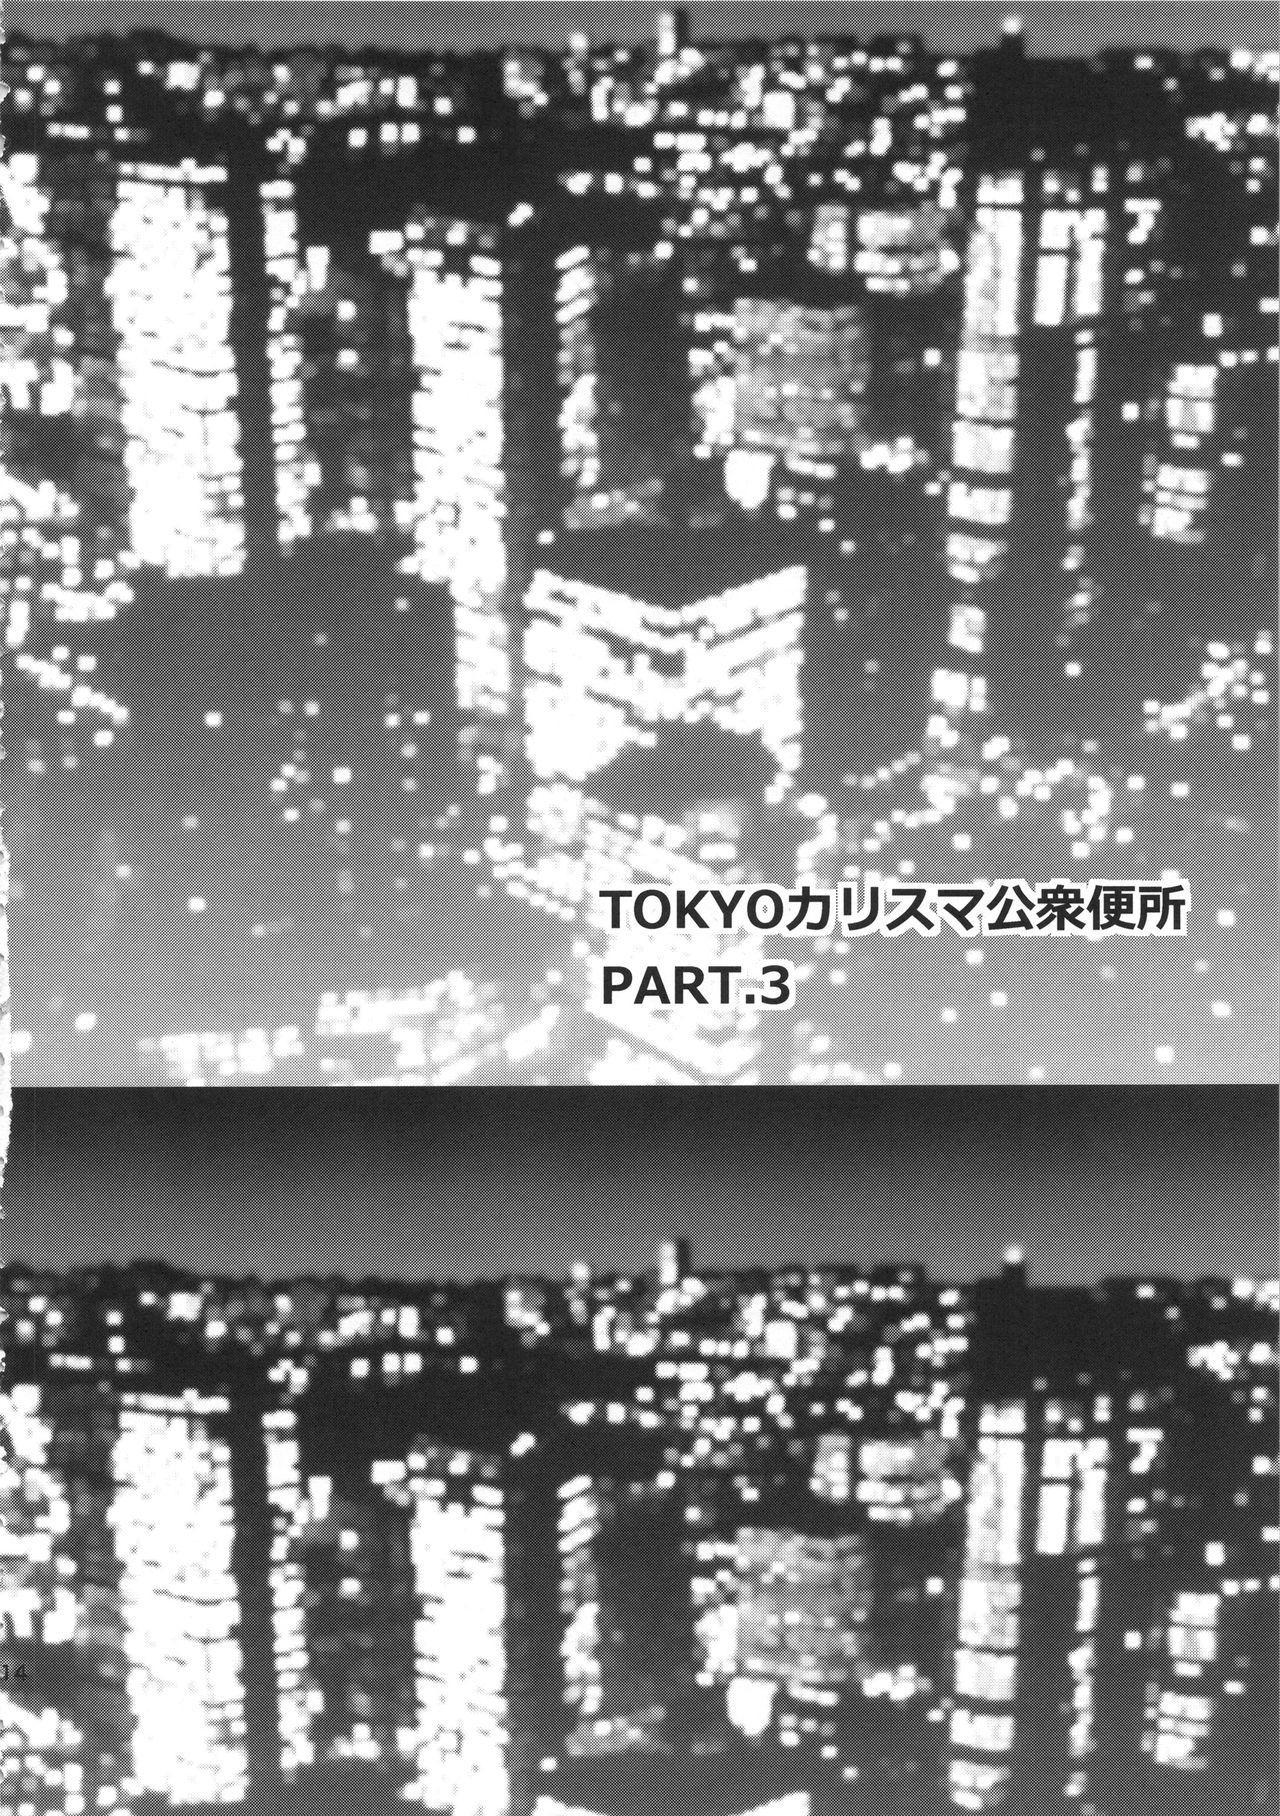 TOKYO Charisma Koushuu Benjo Part. 3 - Tokyo Charismatic Public Lavatory 12